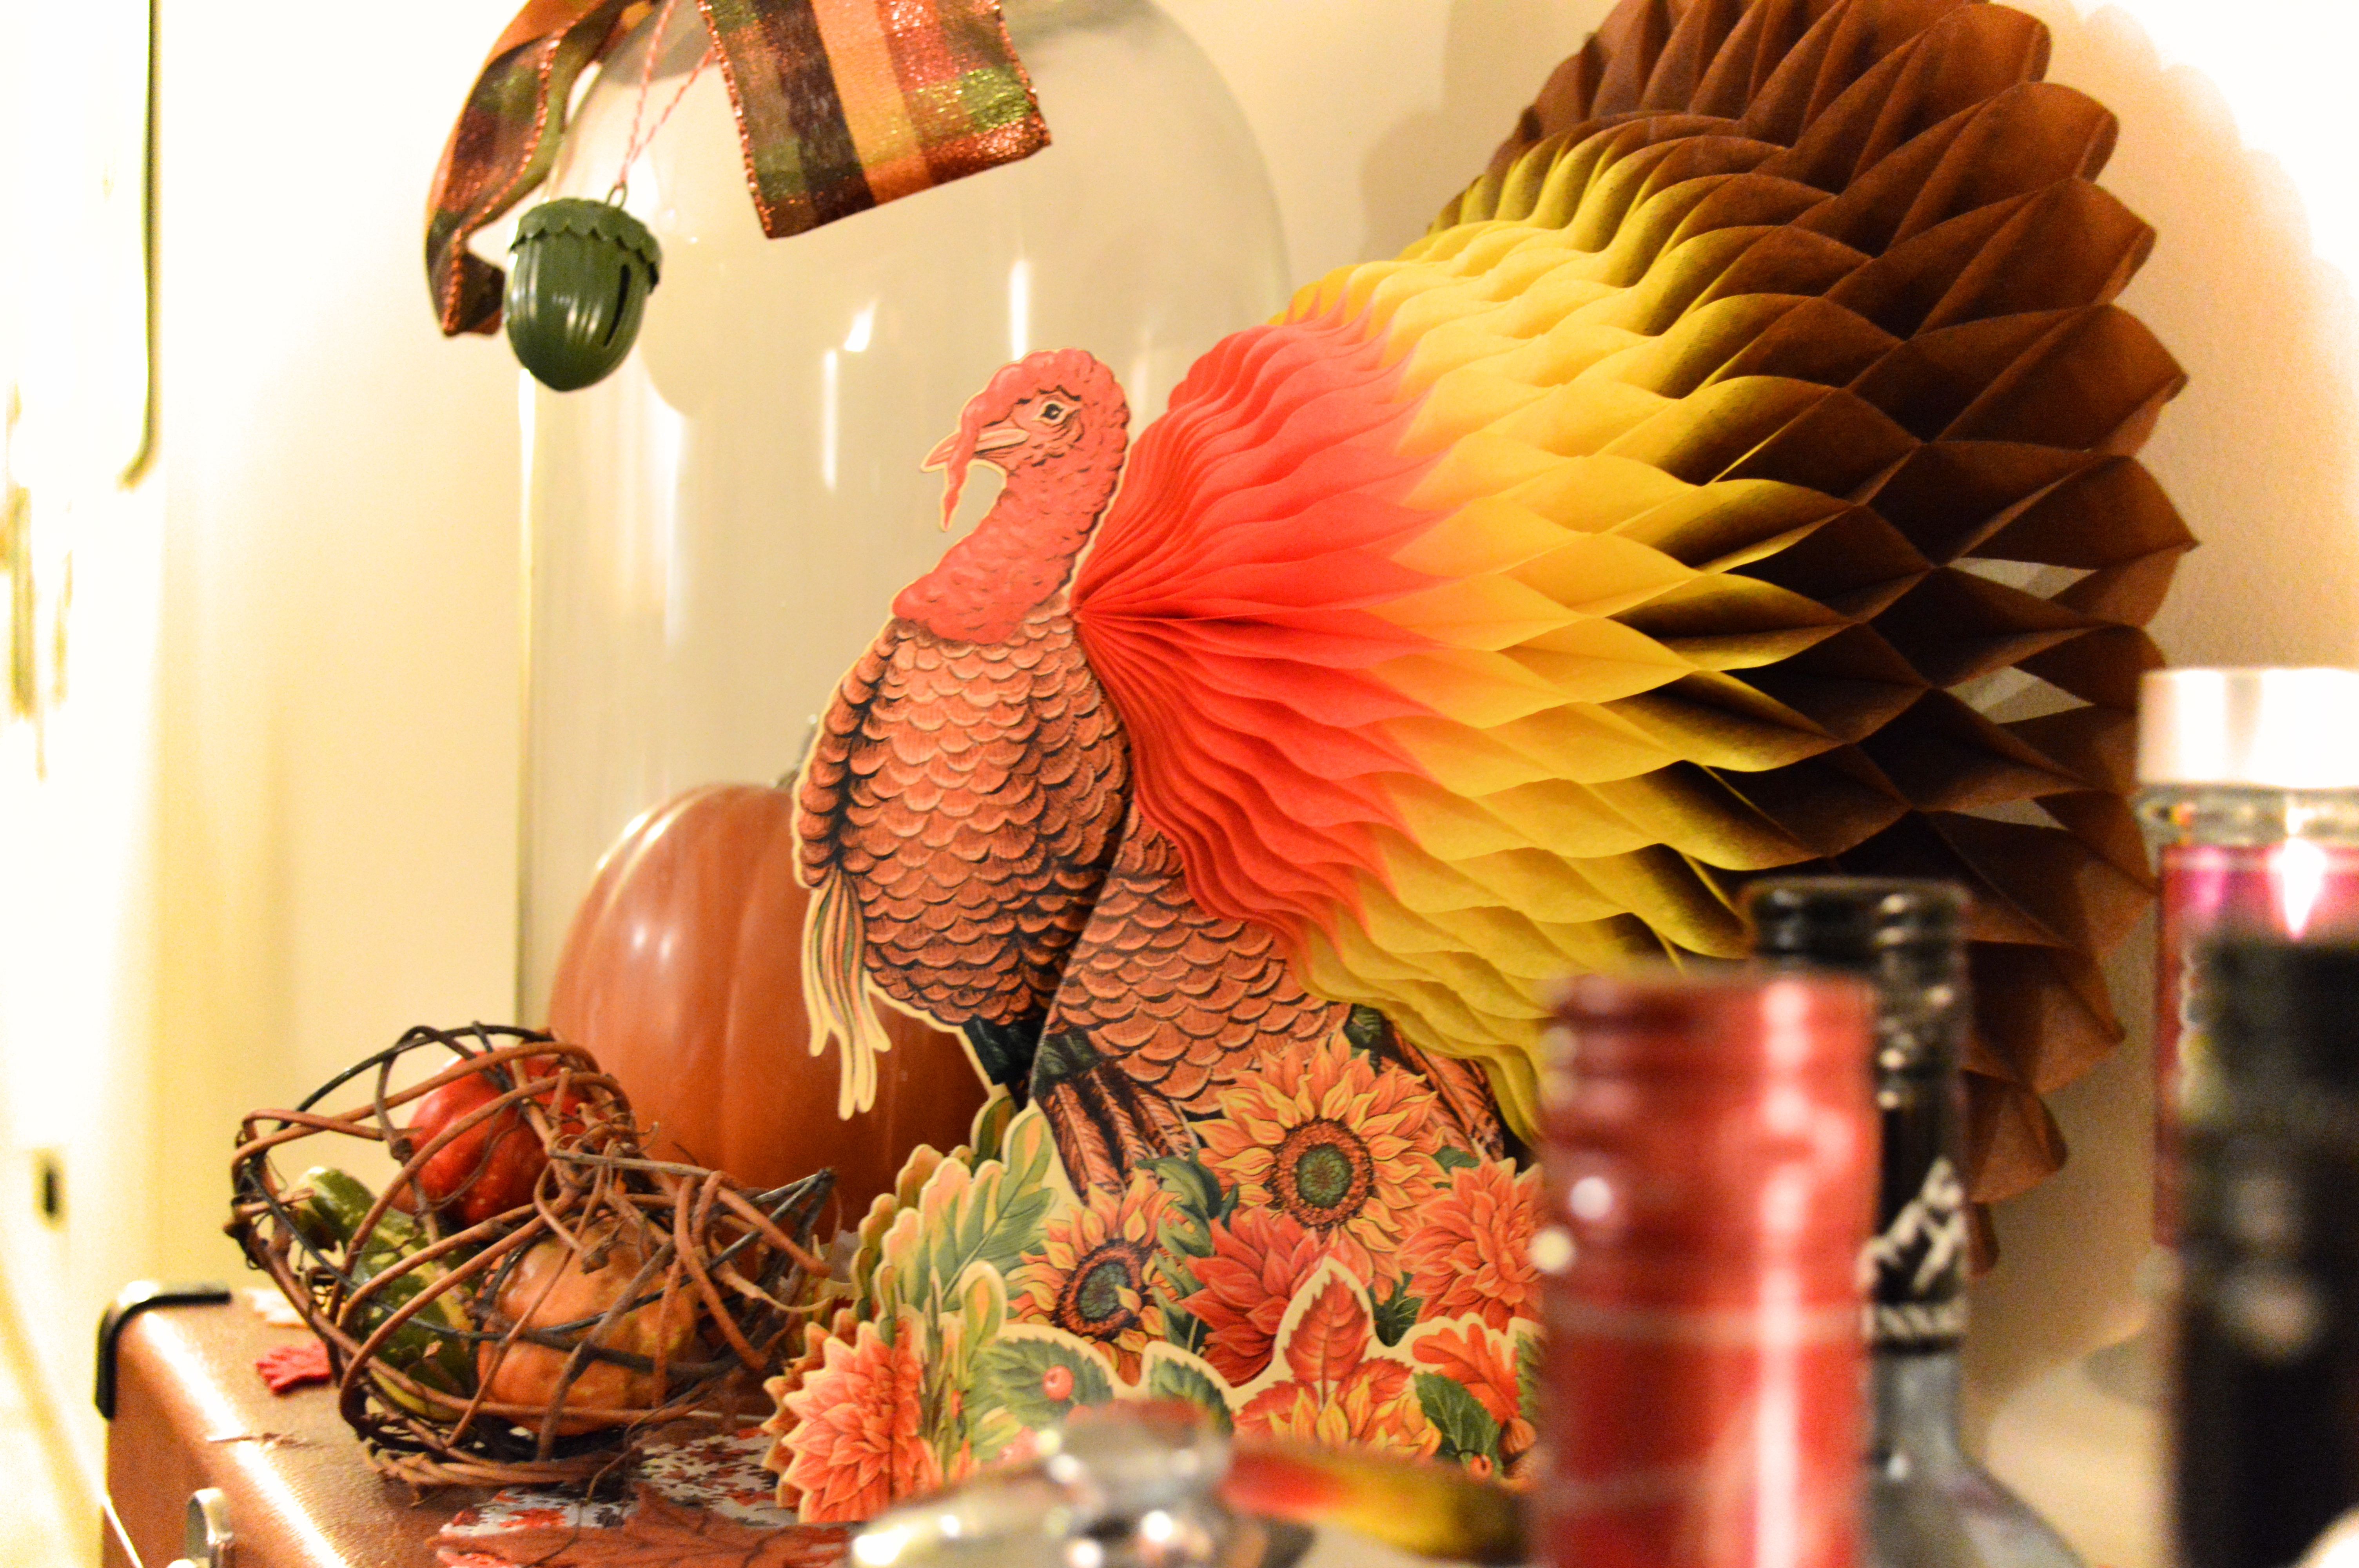 Turkey ornaments item# Turkey 101 thanksgiving ornaments